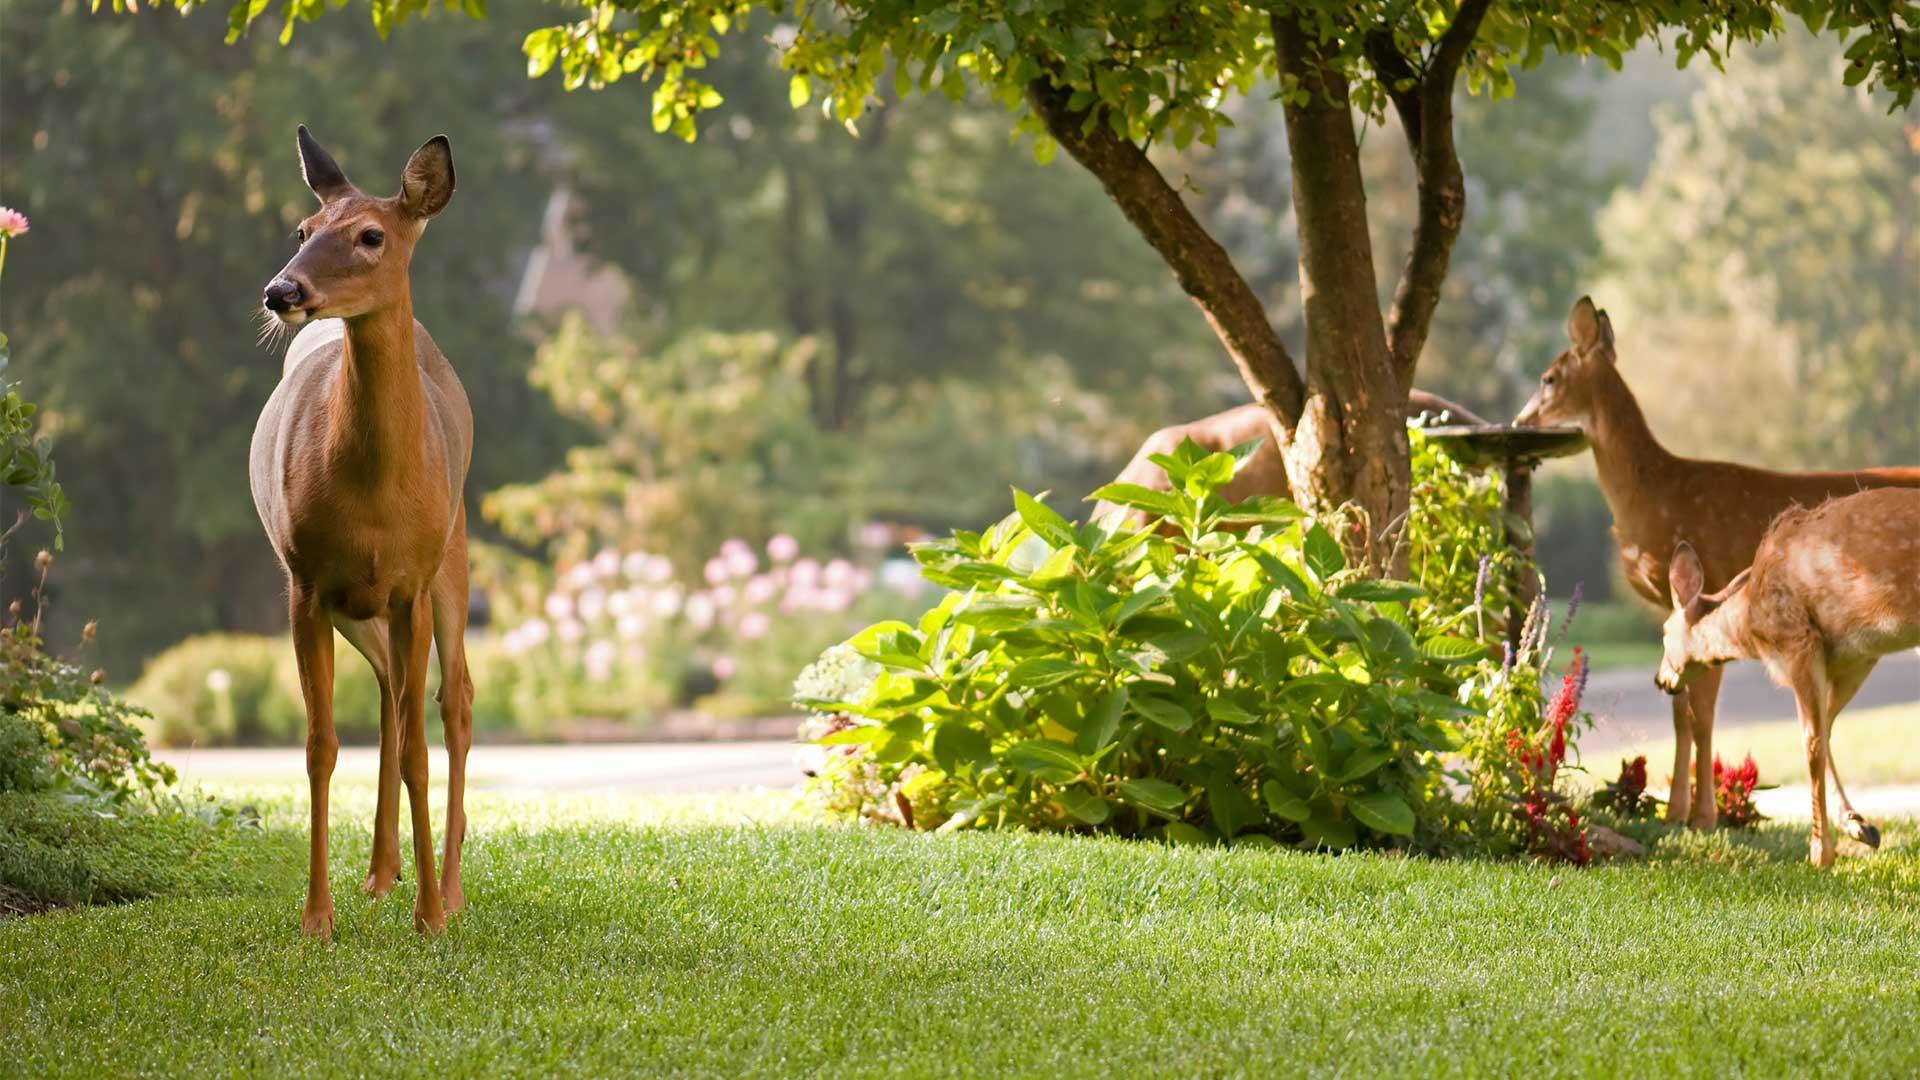 Deer Resistant Trees And Shrubs No More Deer Repellent